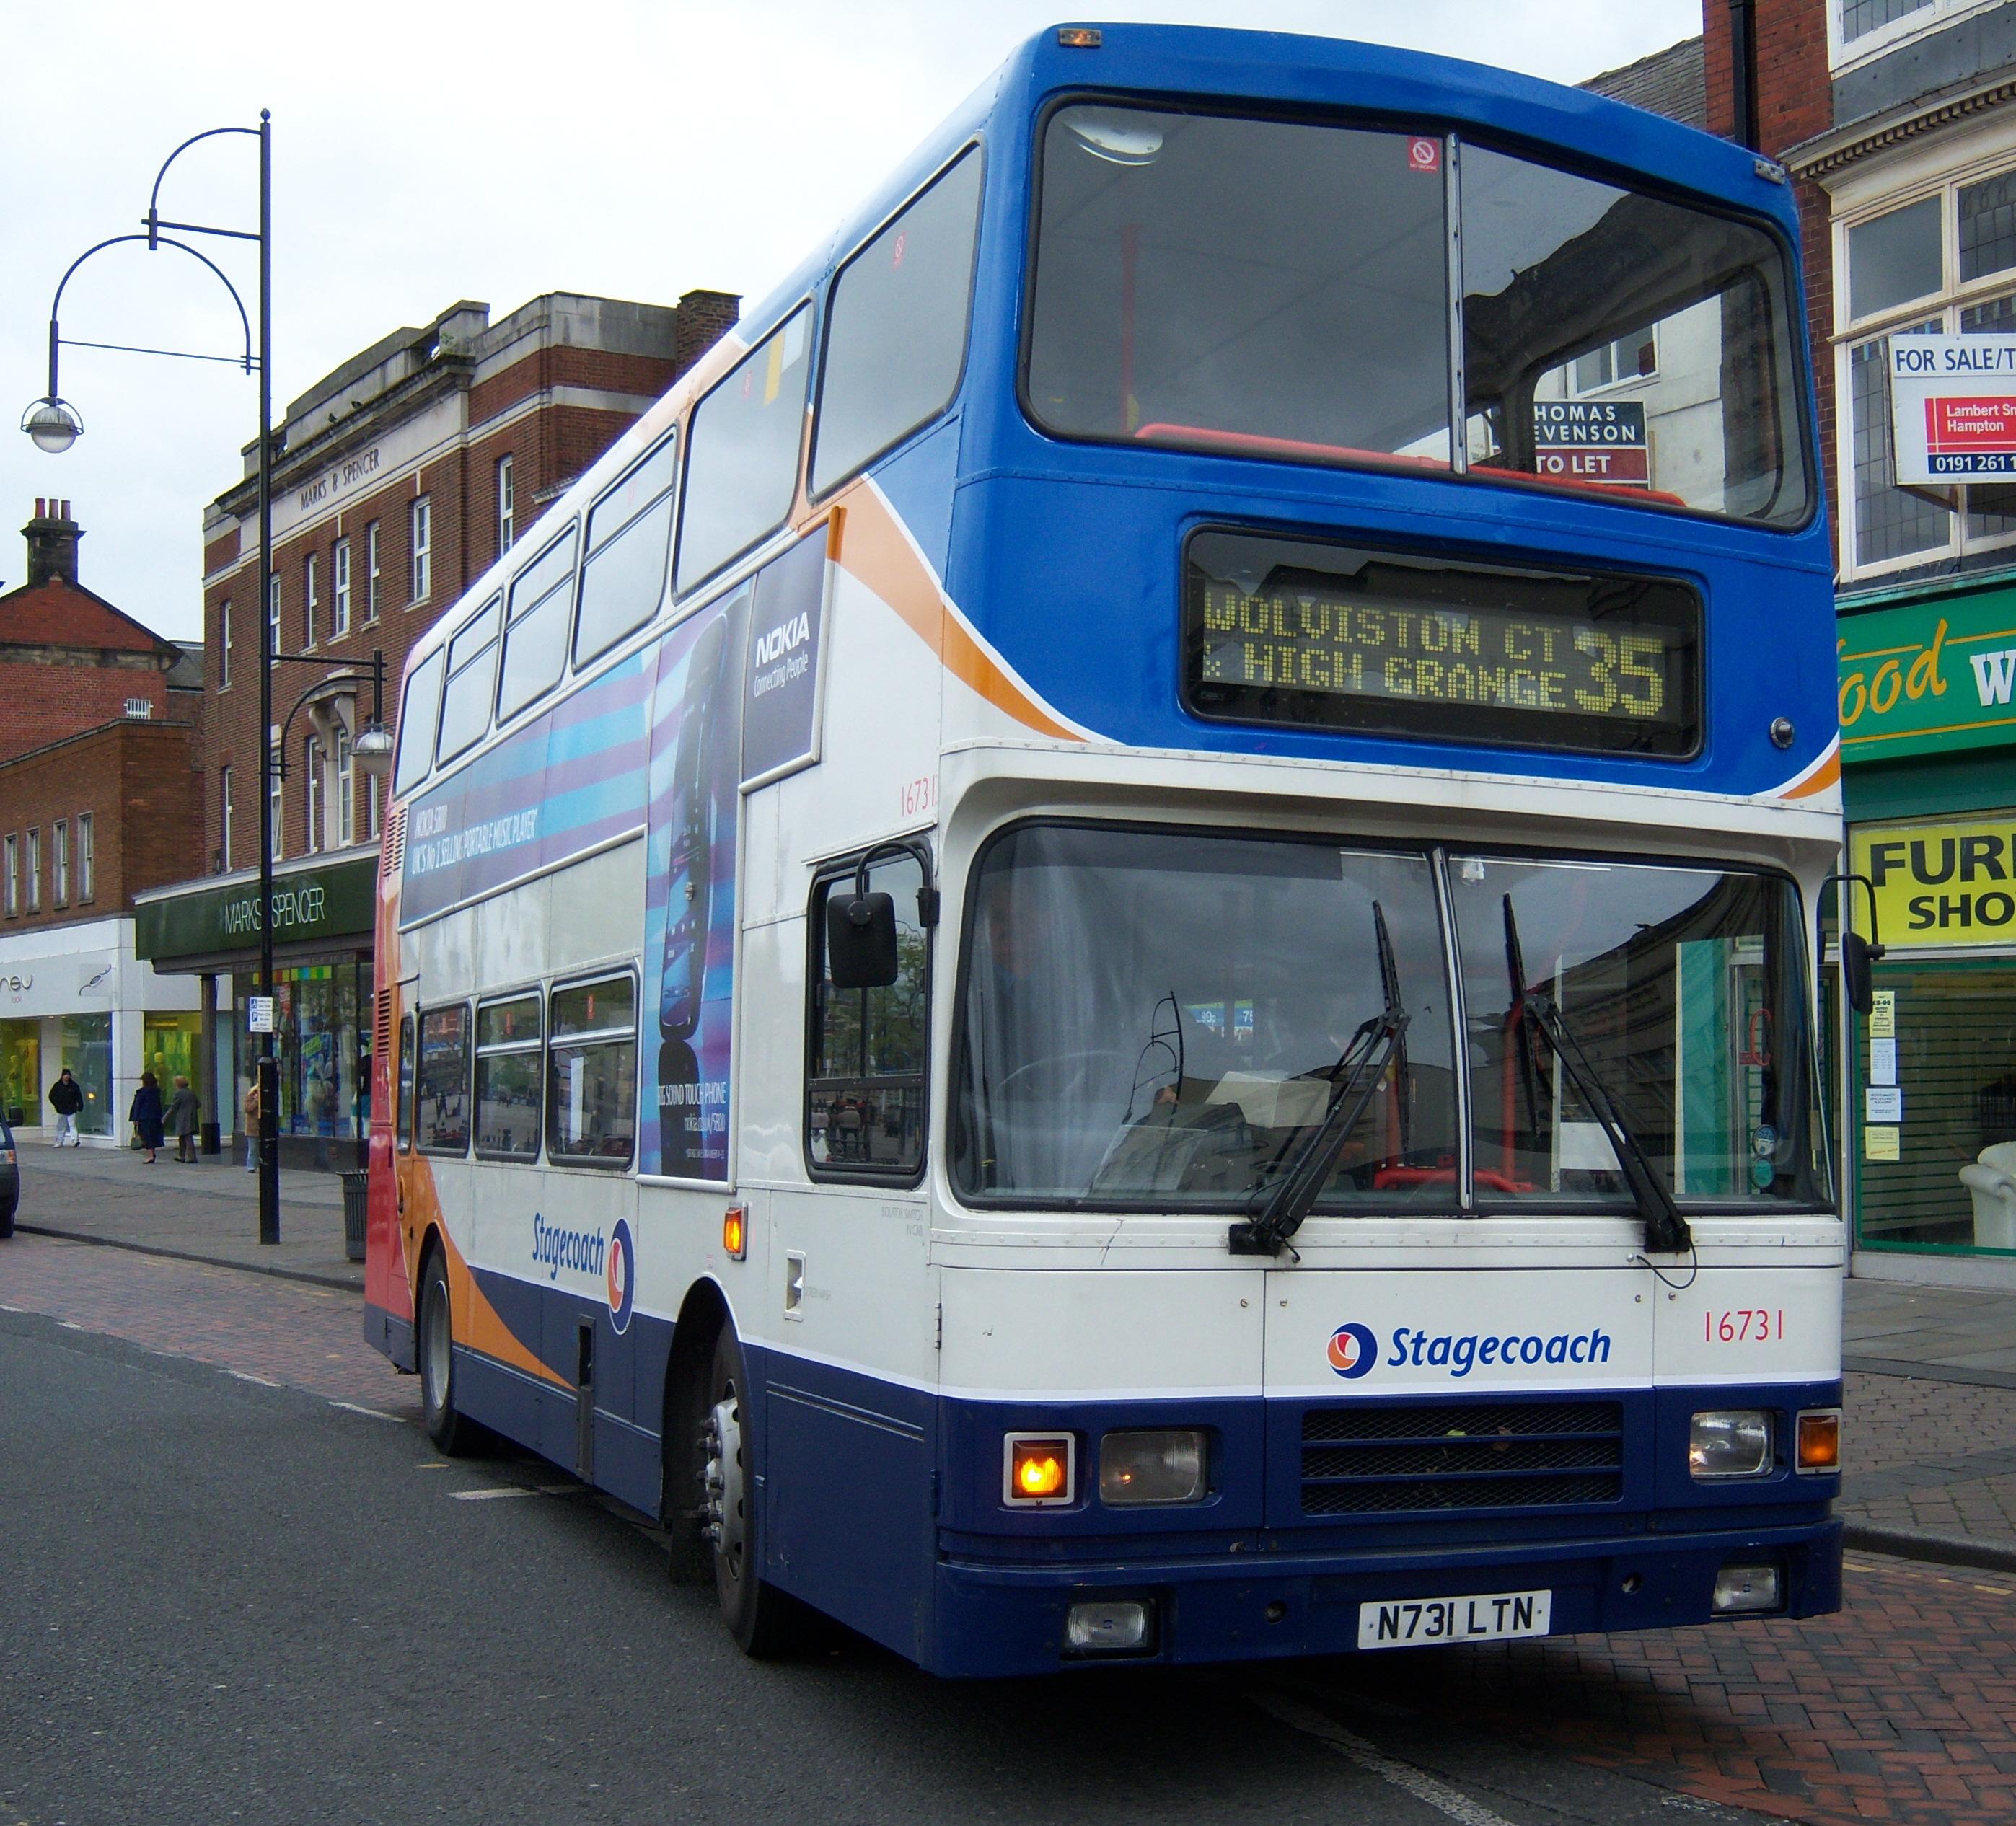 File Stagecoach Bus 16731 Volvo Olympian Alexander Rl N731